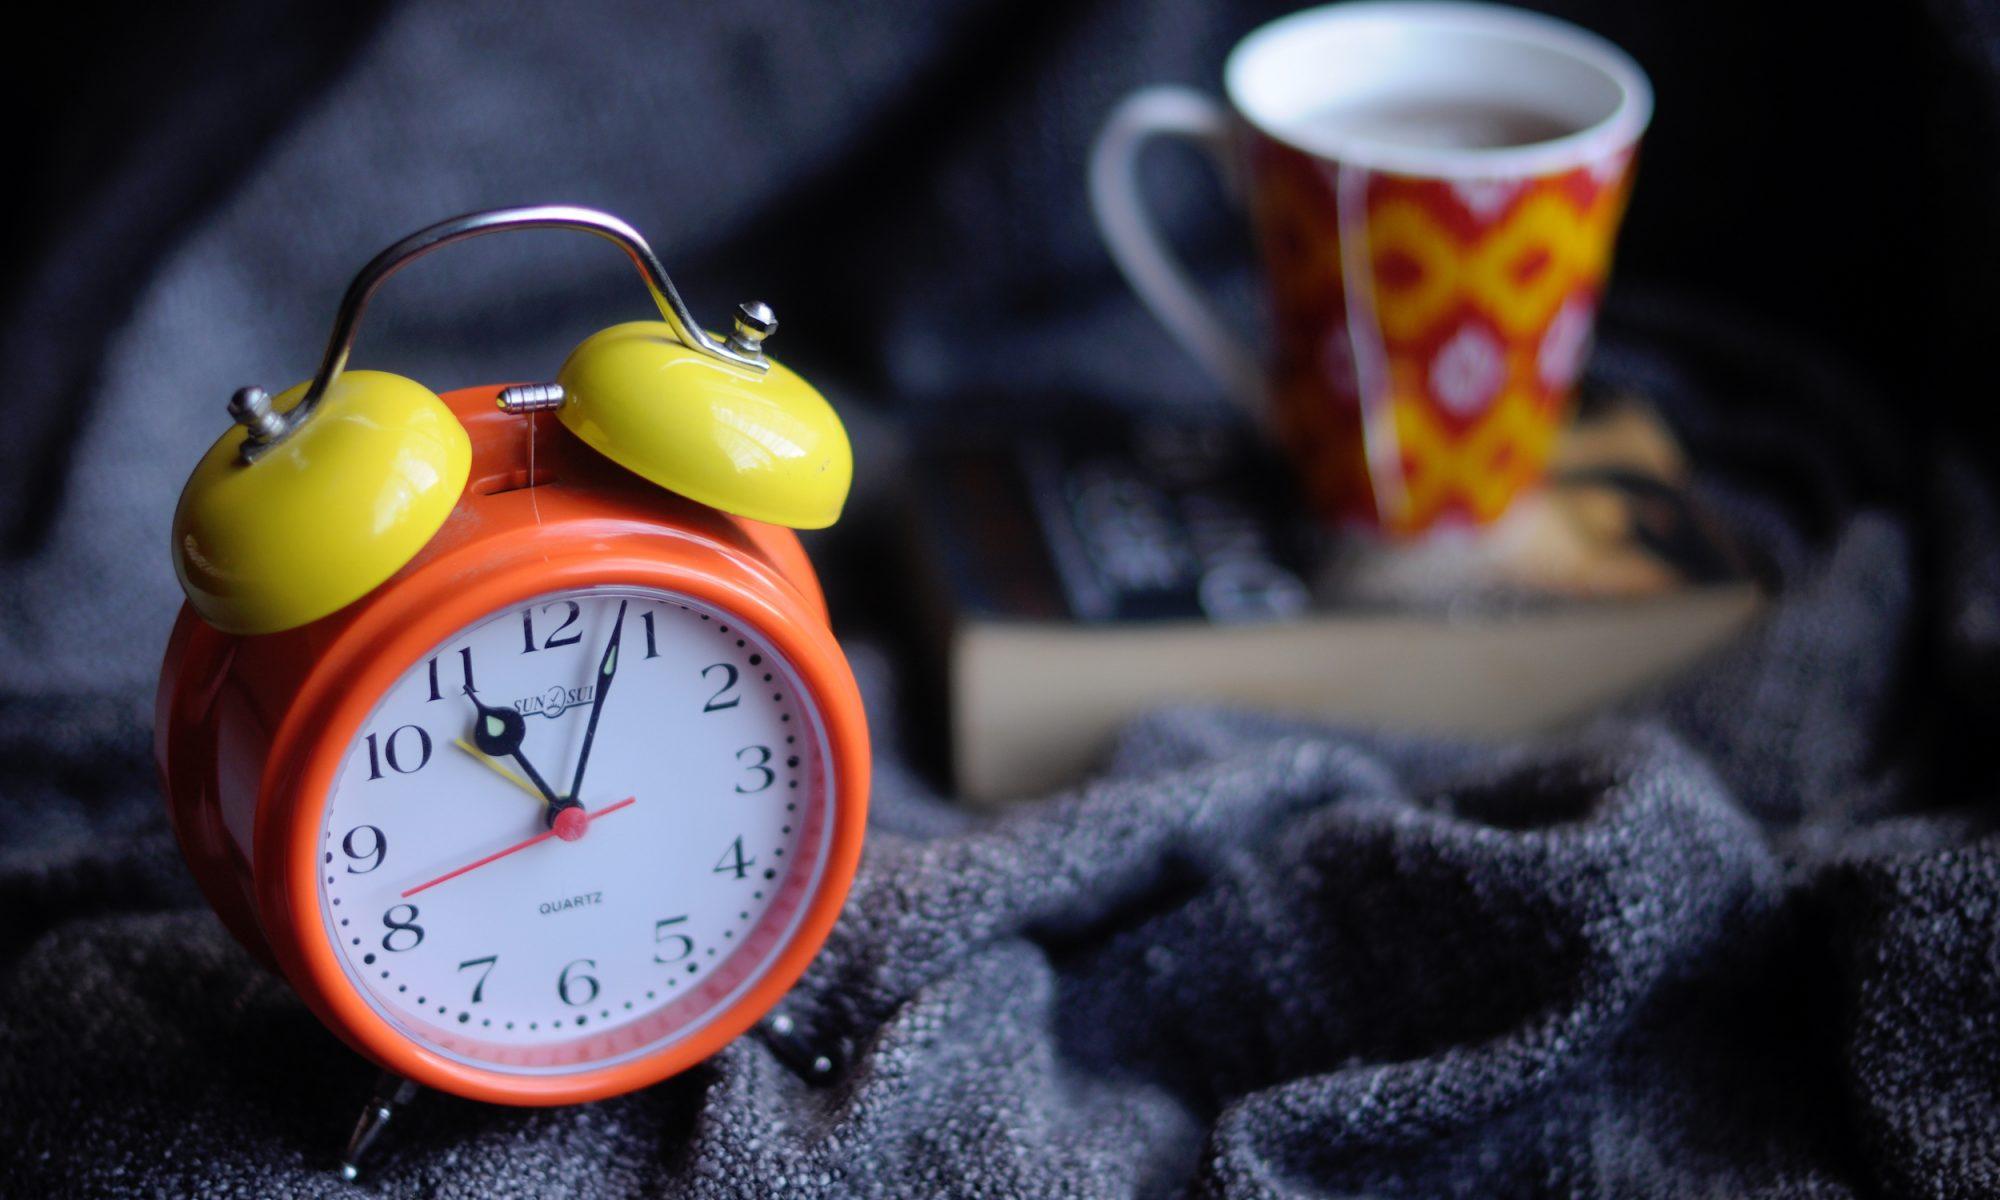 EC: The Science of Breakfast Time, According to Alan Burdick